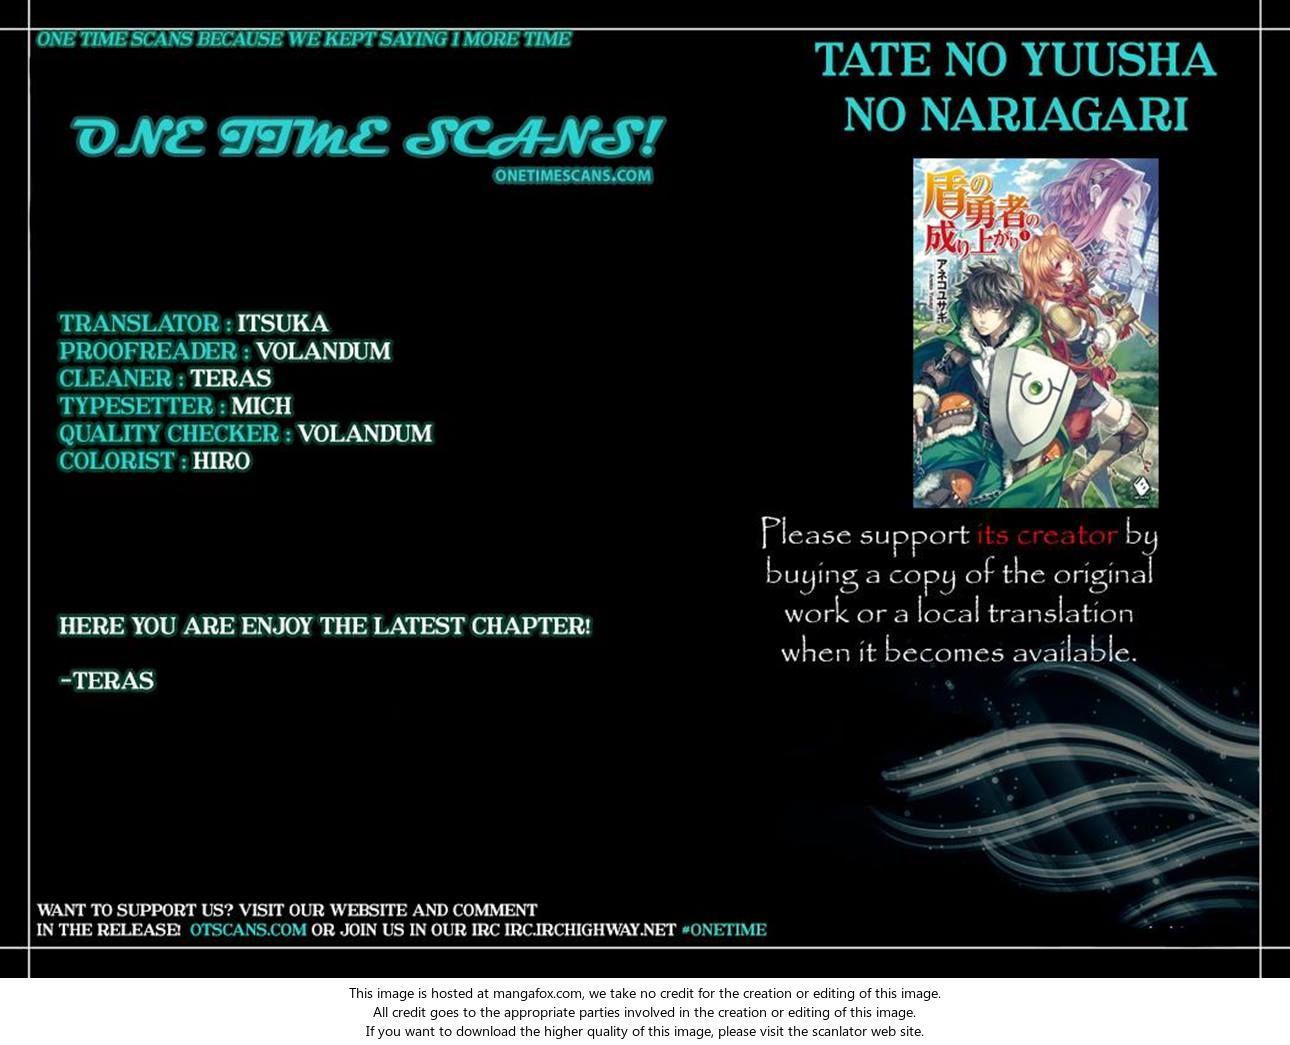 Tate no Yuusha no Nariagari 21: Nightmare at MangaFox